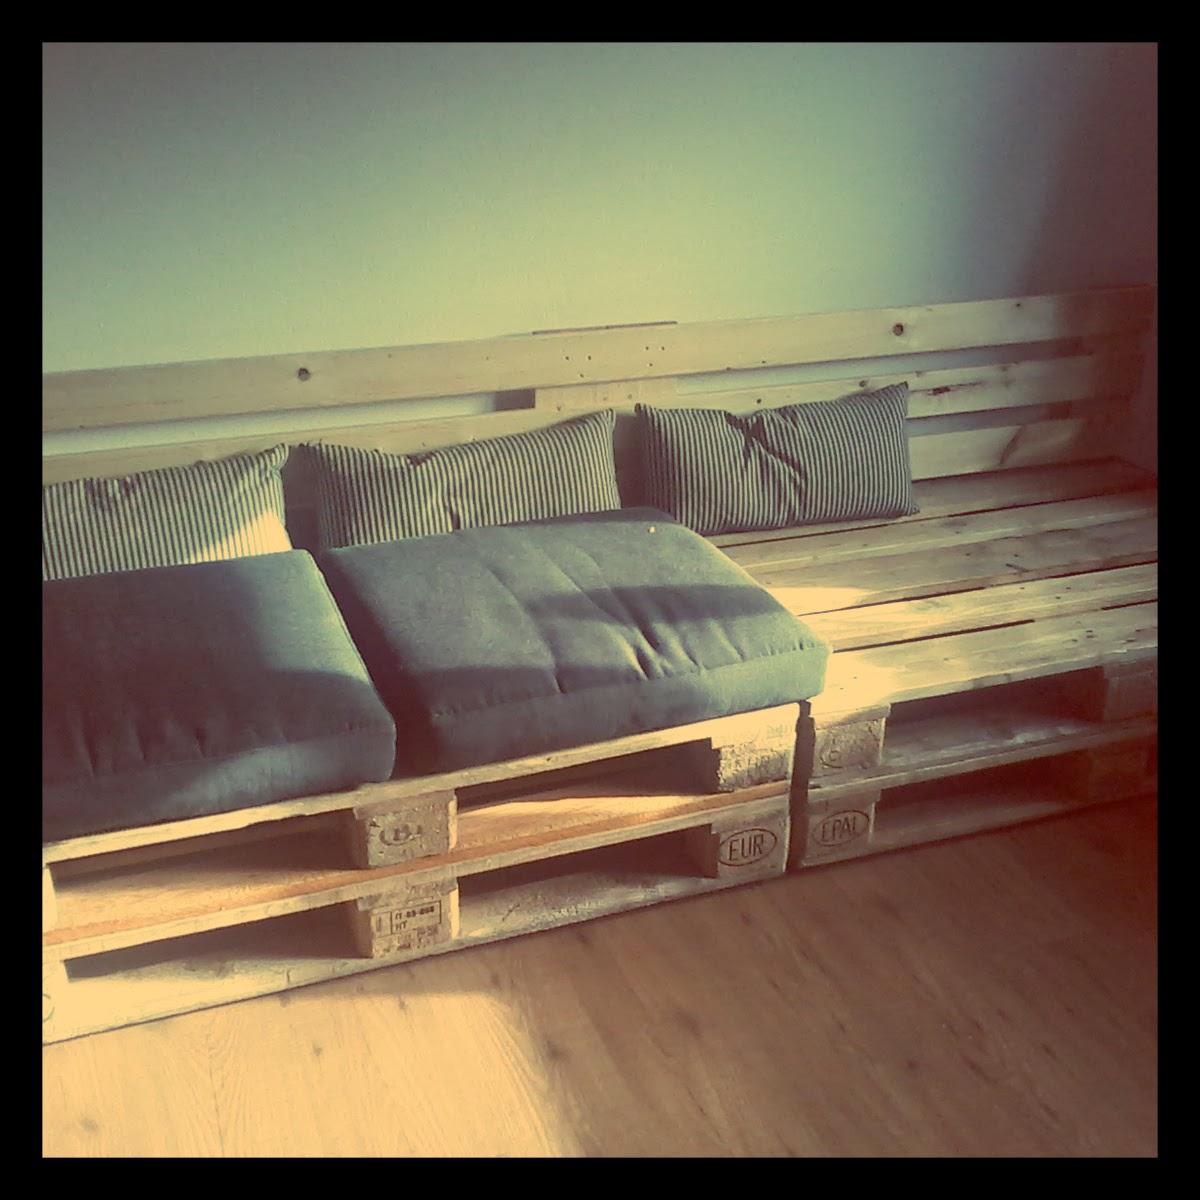 Idea design ecologico divano pallet - Divano pallet schienale ...